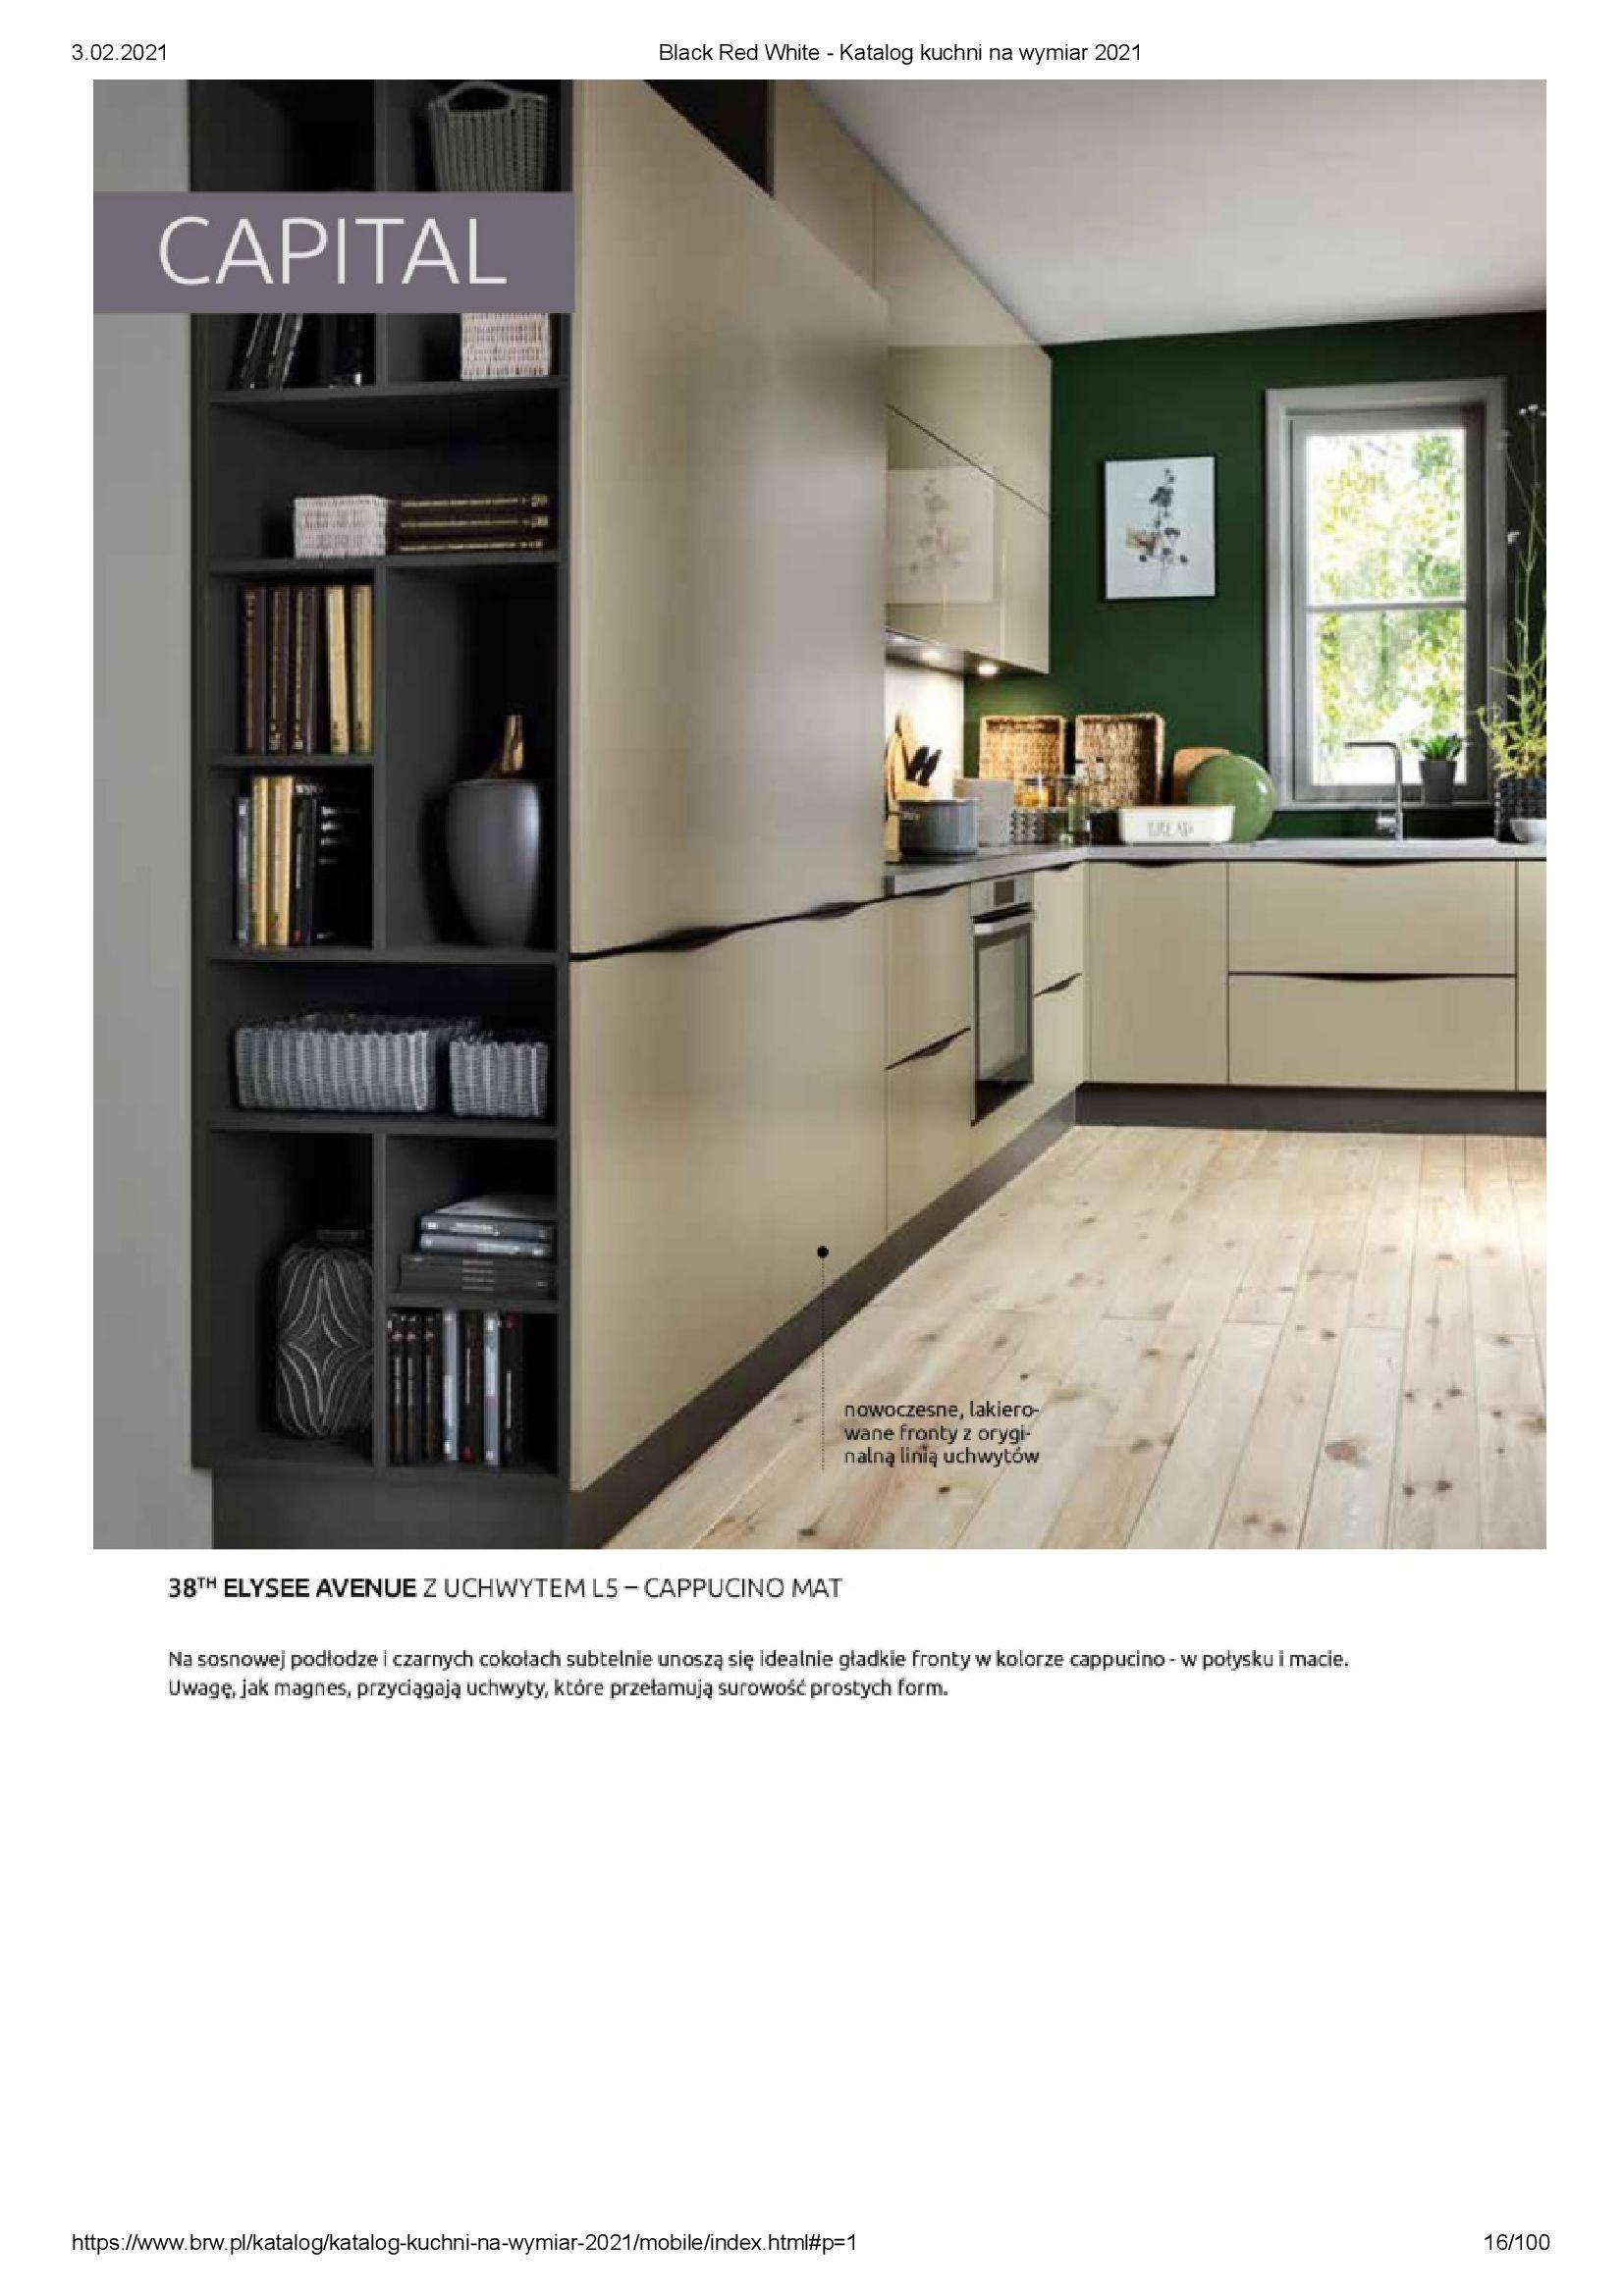 Gazetka Black Red White: Katalog - Kuchnie na wymiar Senso Kitchens 2021 2021-01-01 page-16